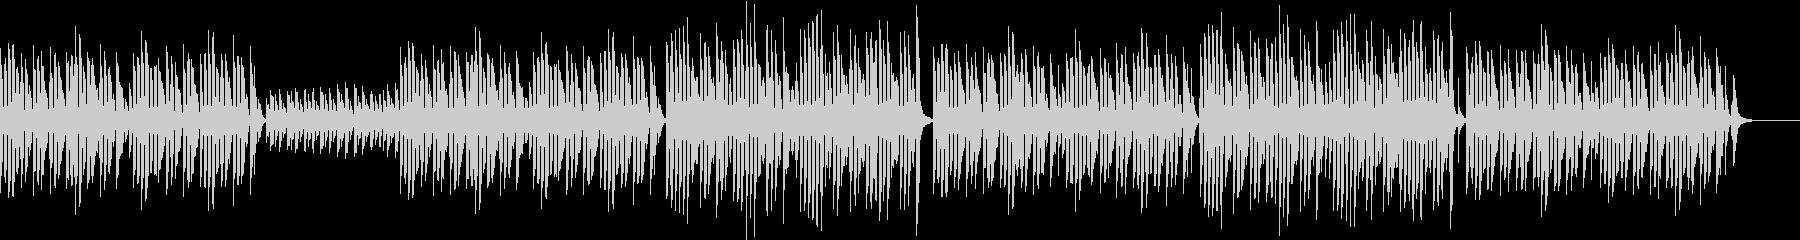 bpm084 キッズTikTok可愛い笛の未再生の波形